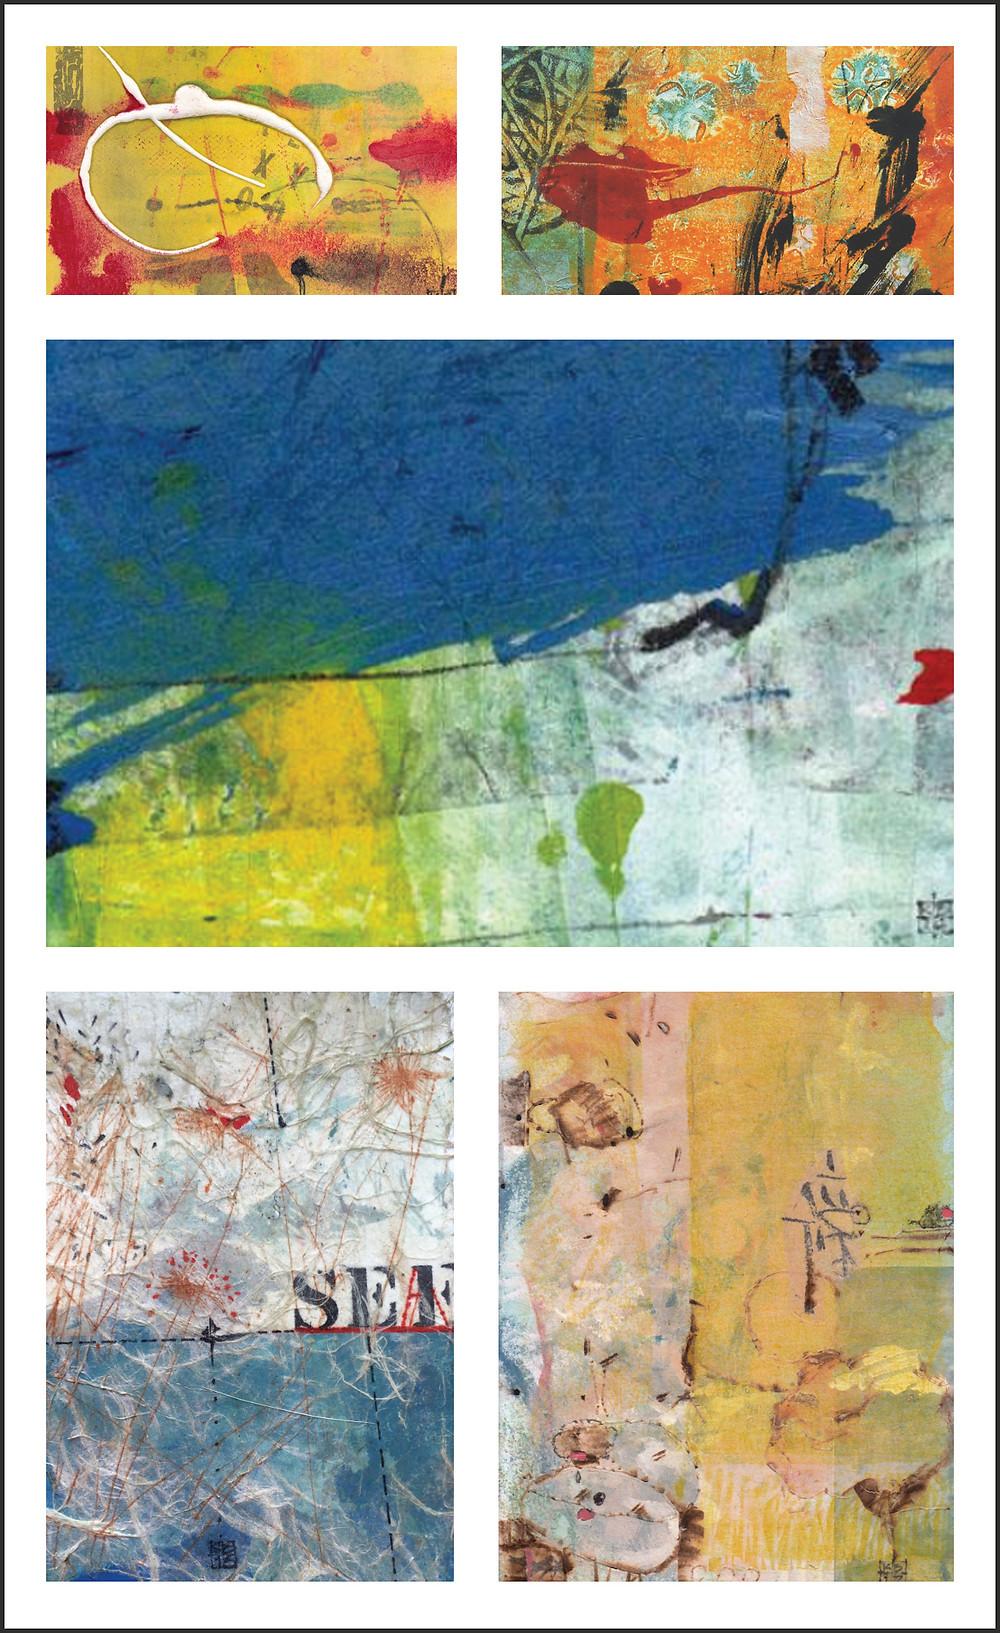 A collage of Karin Bruckner's entries